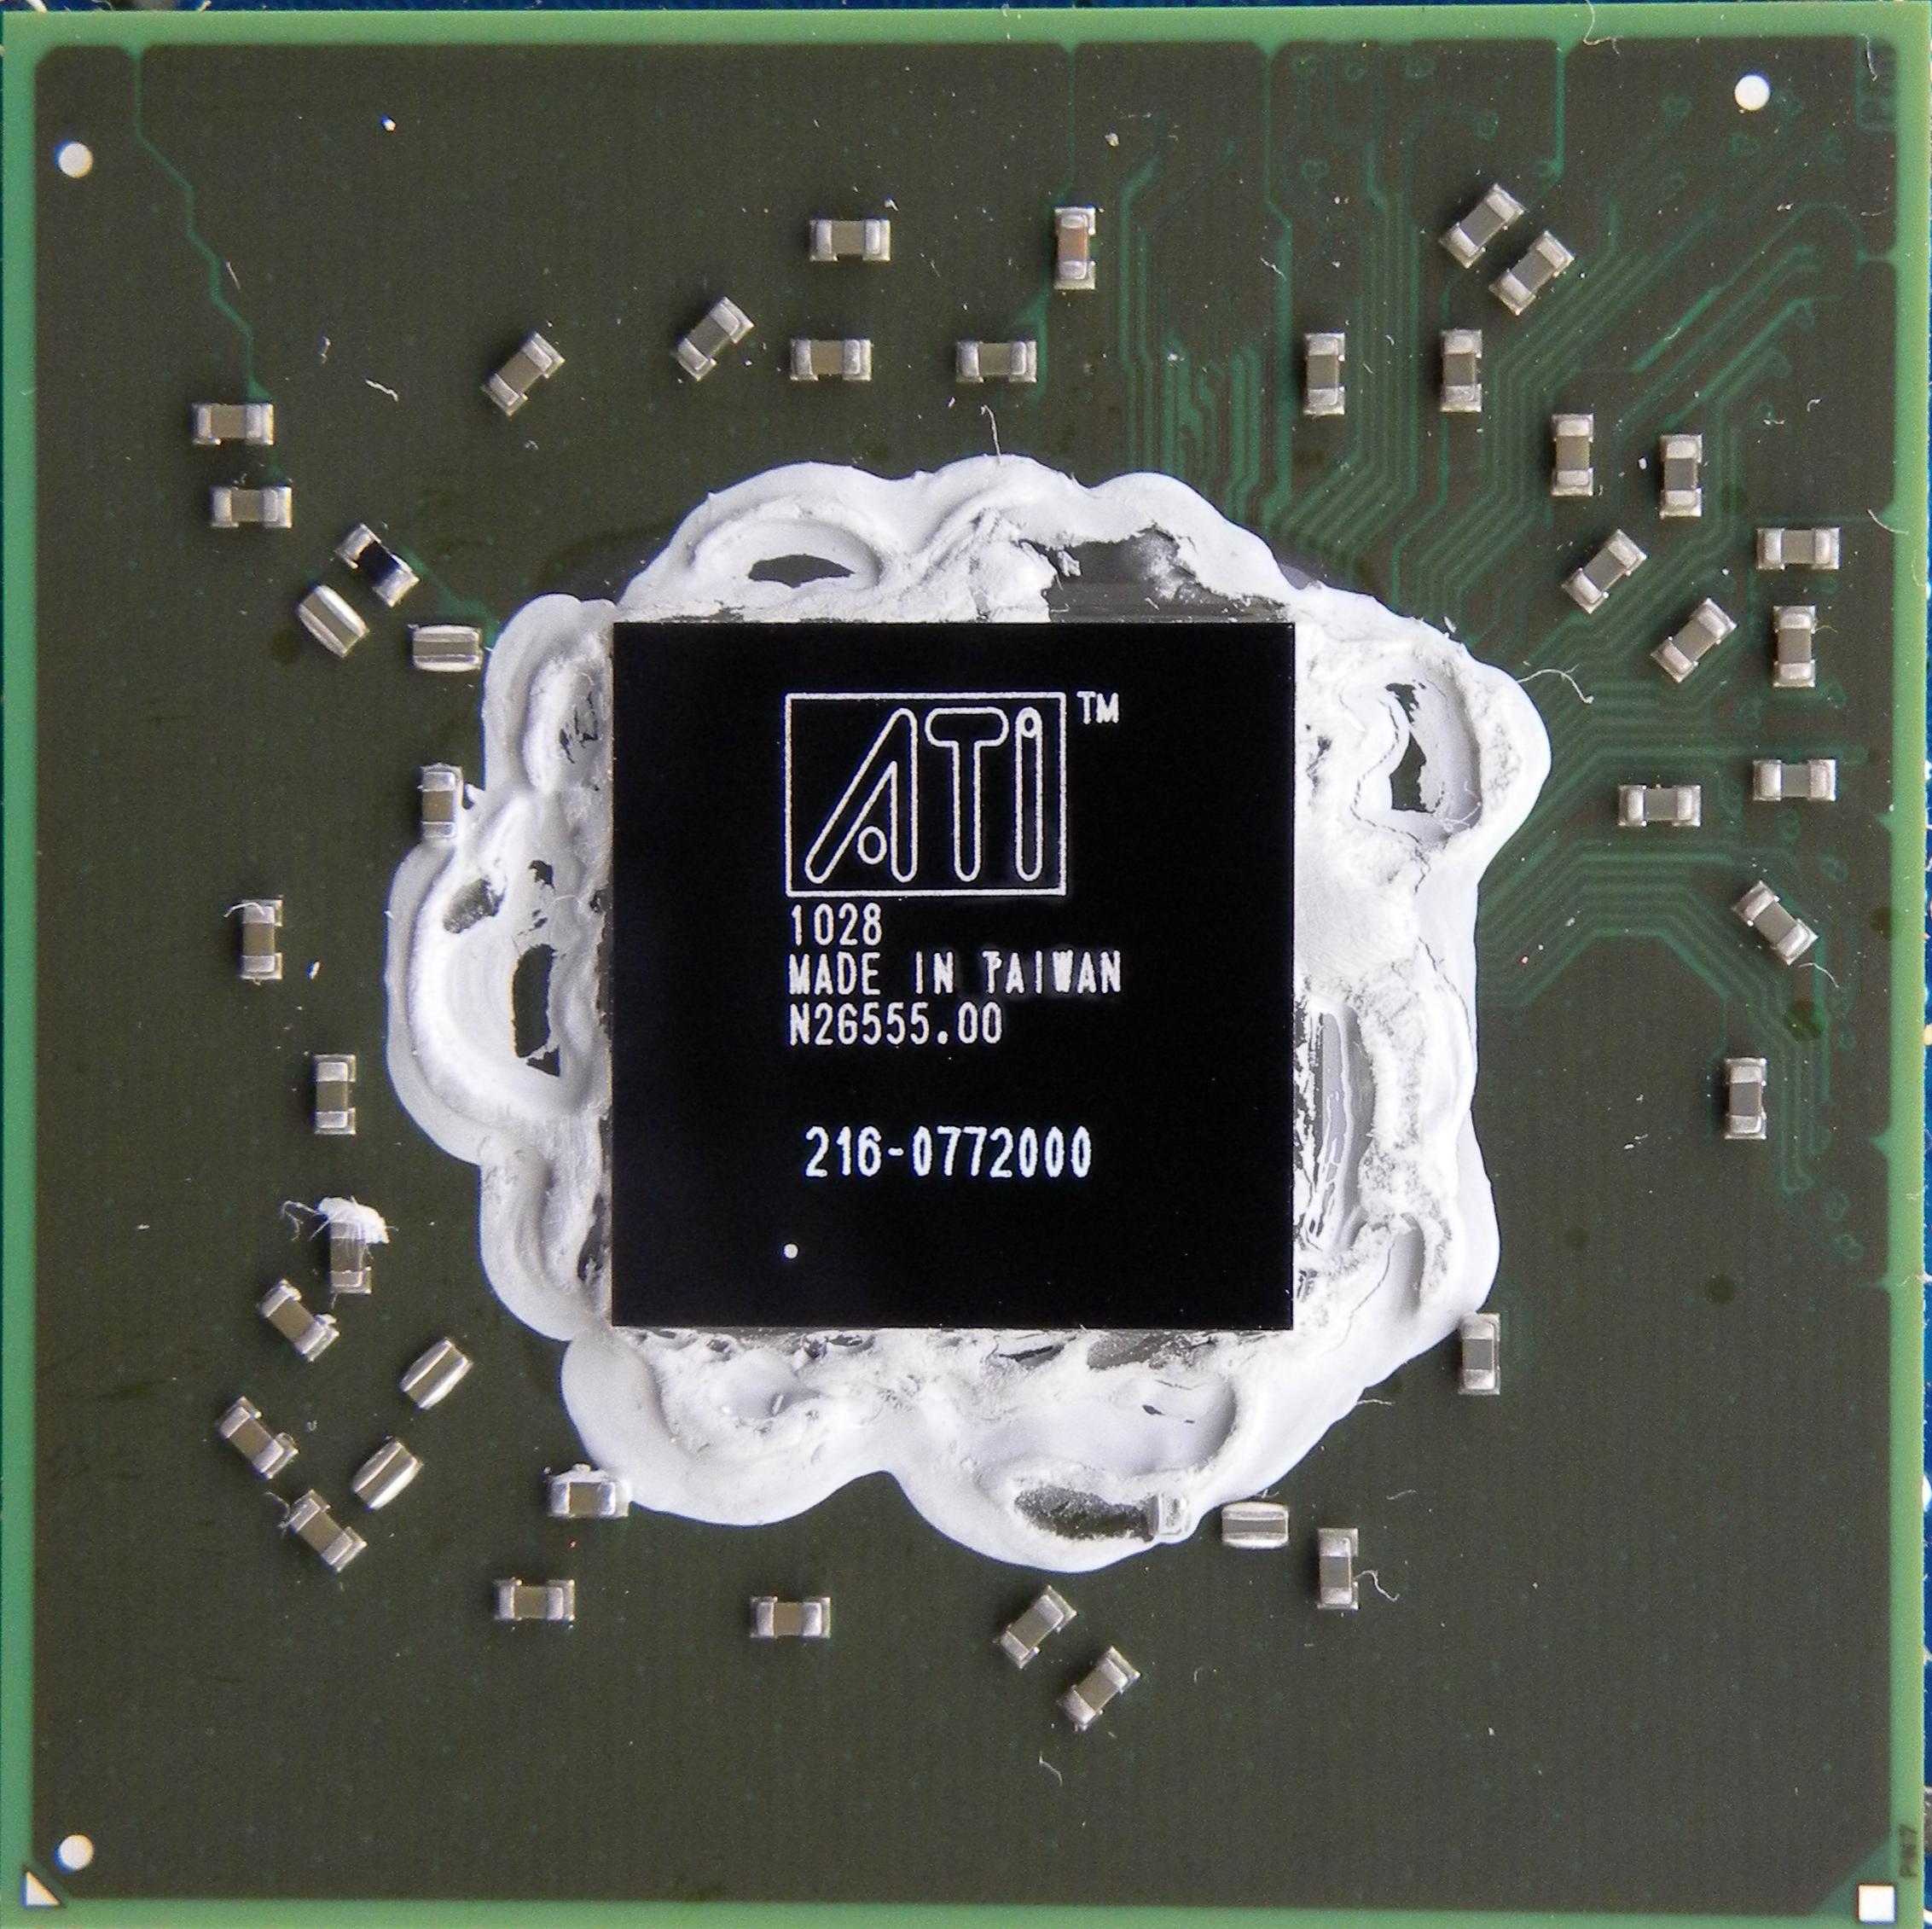 AMD/ATI Mobility Radeon HD mobility drivers for Microsoft Windows XP 32bit